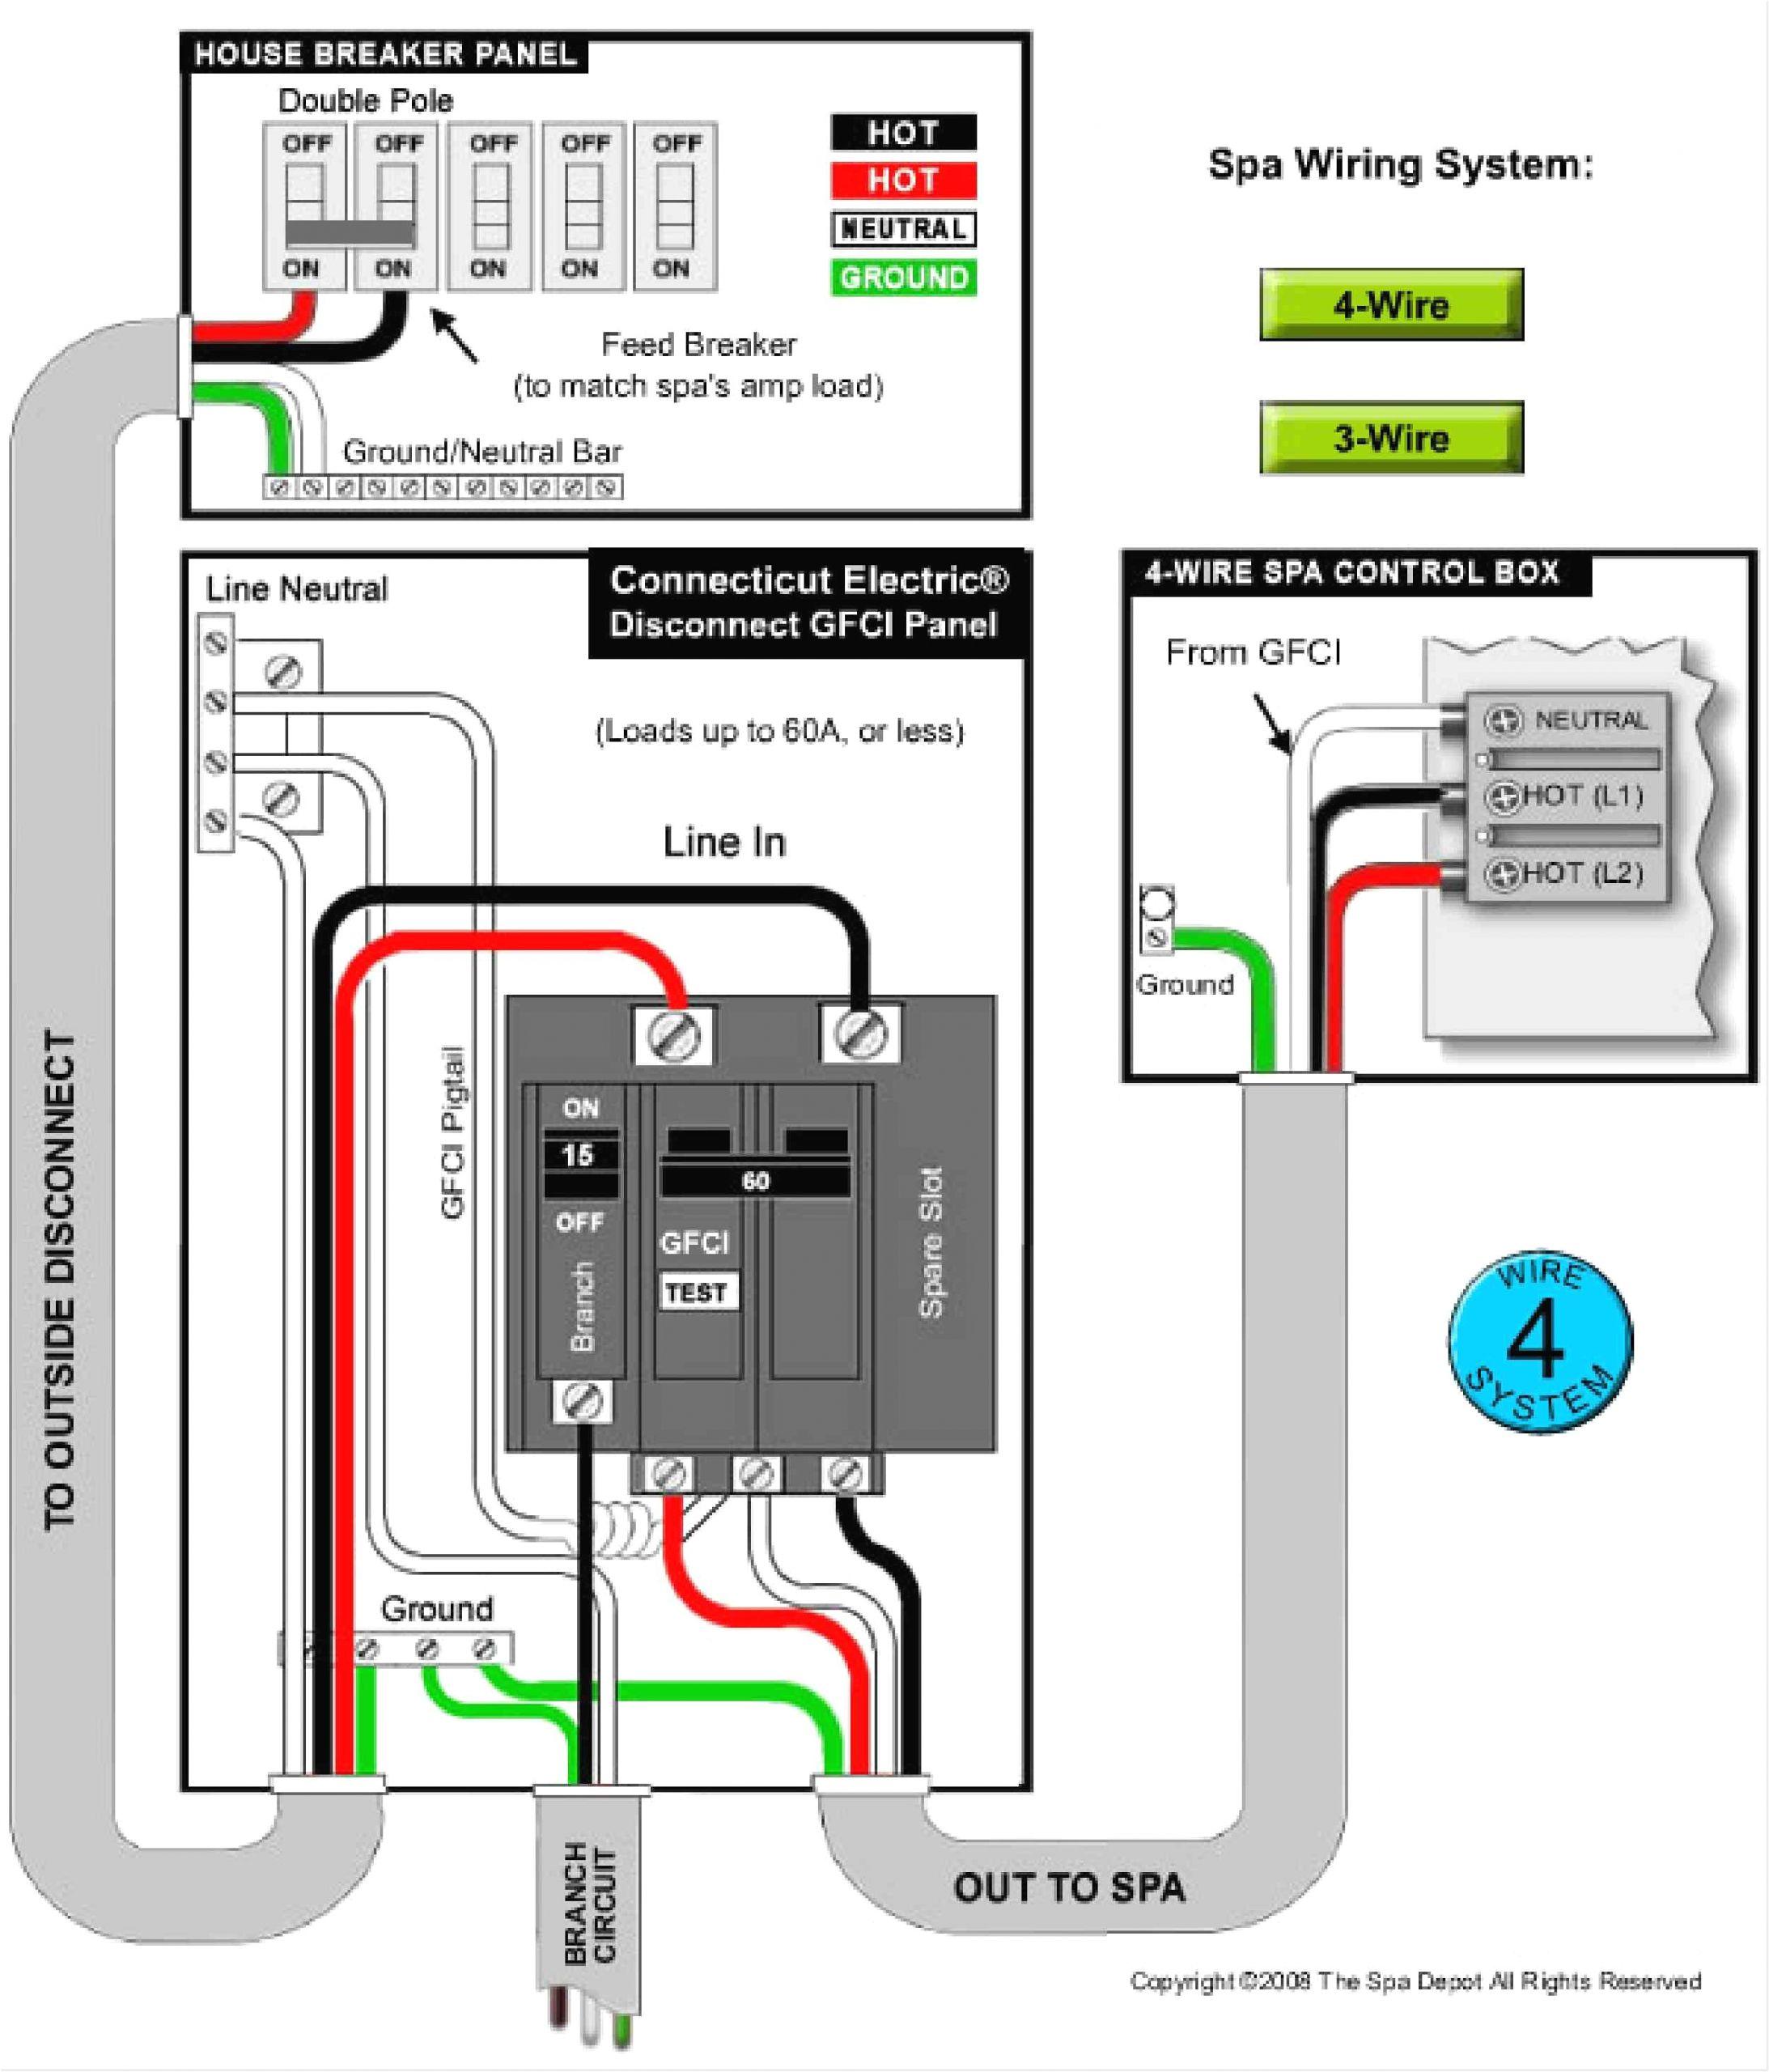 50 amp square d gfci breaker wiring diagram square d gfci circuit breakers wiring diagram emprendedorlink wire rh insurapro co square d gfci wiring 18a jpg